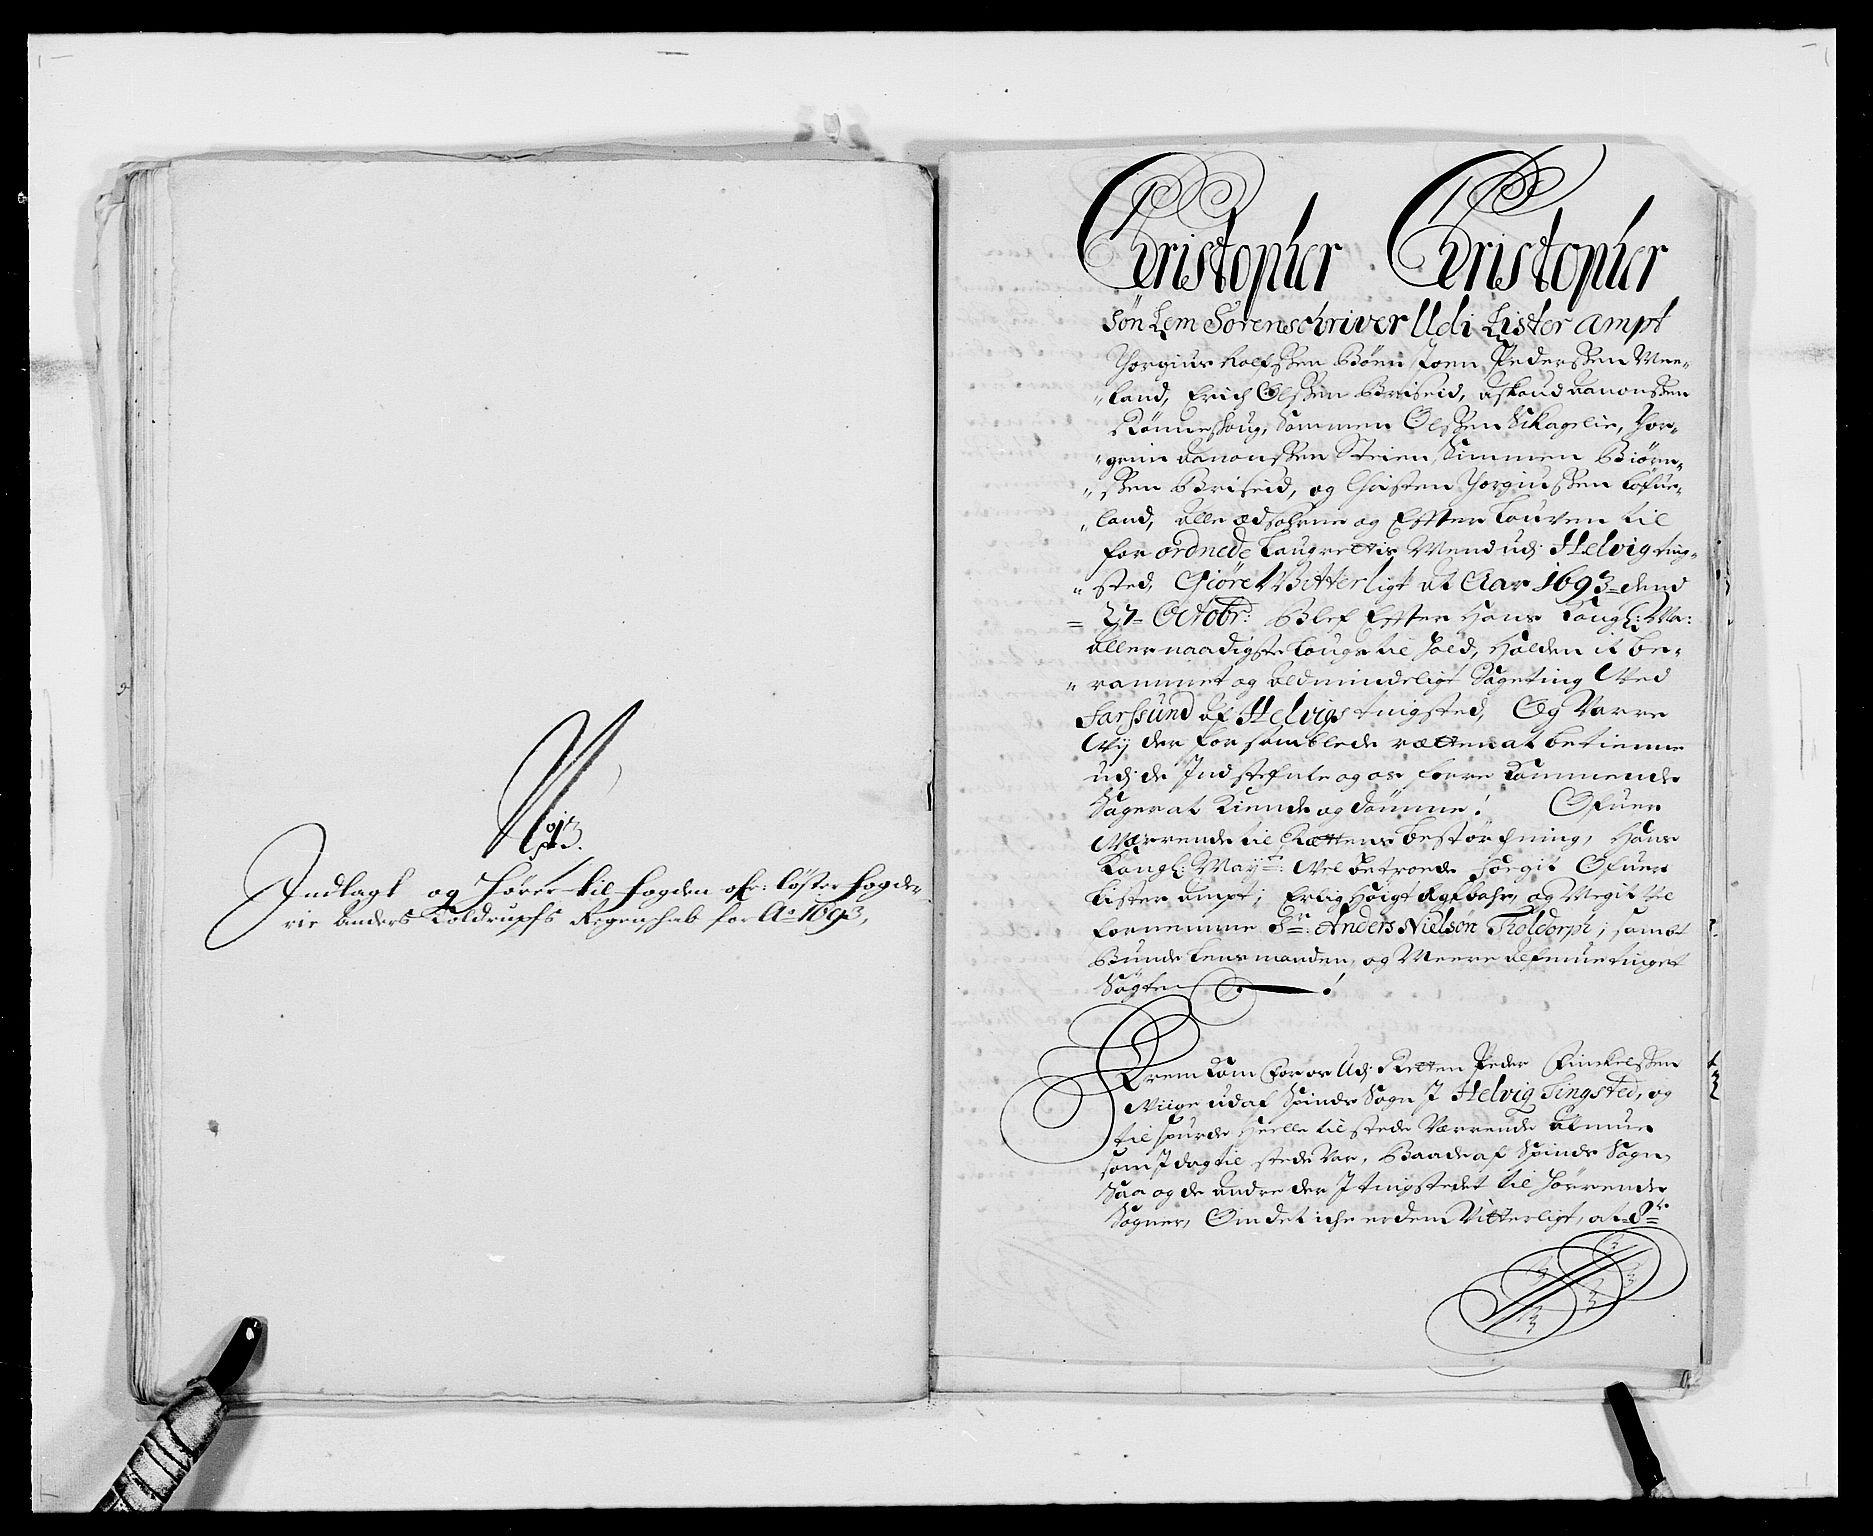 RA, Rentekammeret inntil 1814, Reviderte regnskaper, Fogderegnskap, R41/L2536: Fogderegnskap Lista, 1690-1693, s. 493